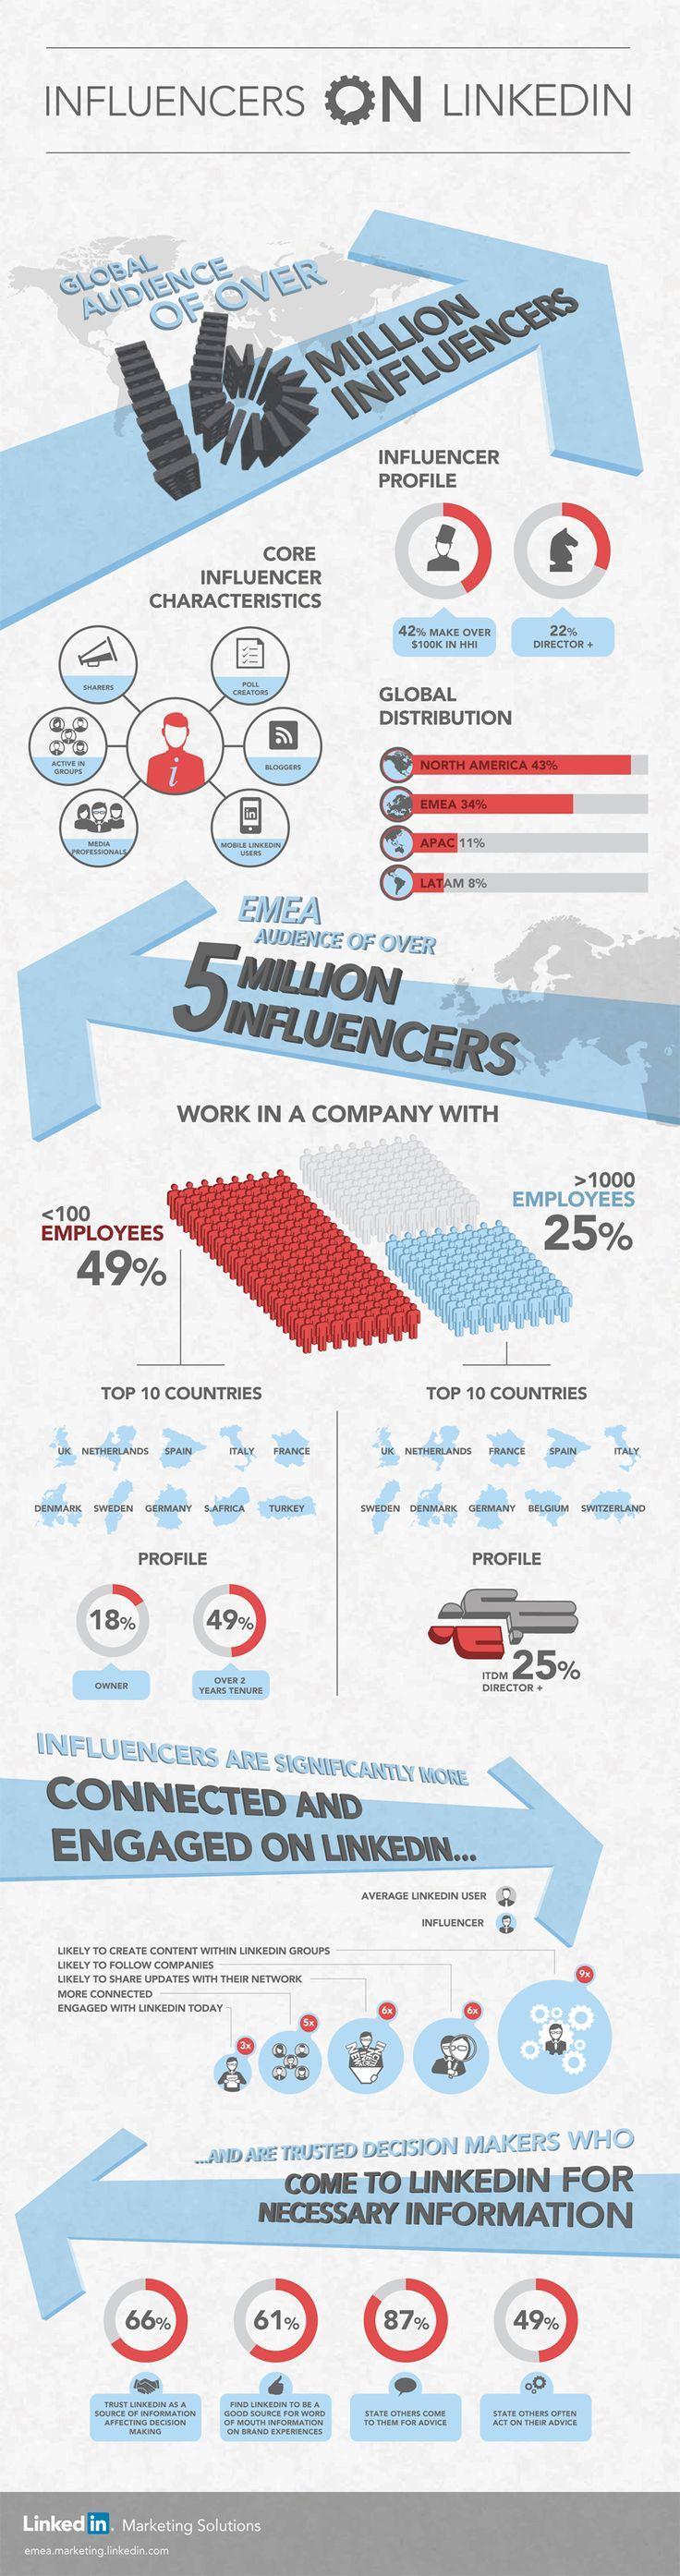 Influencers on #LinkedIn